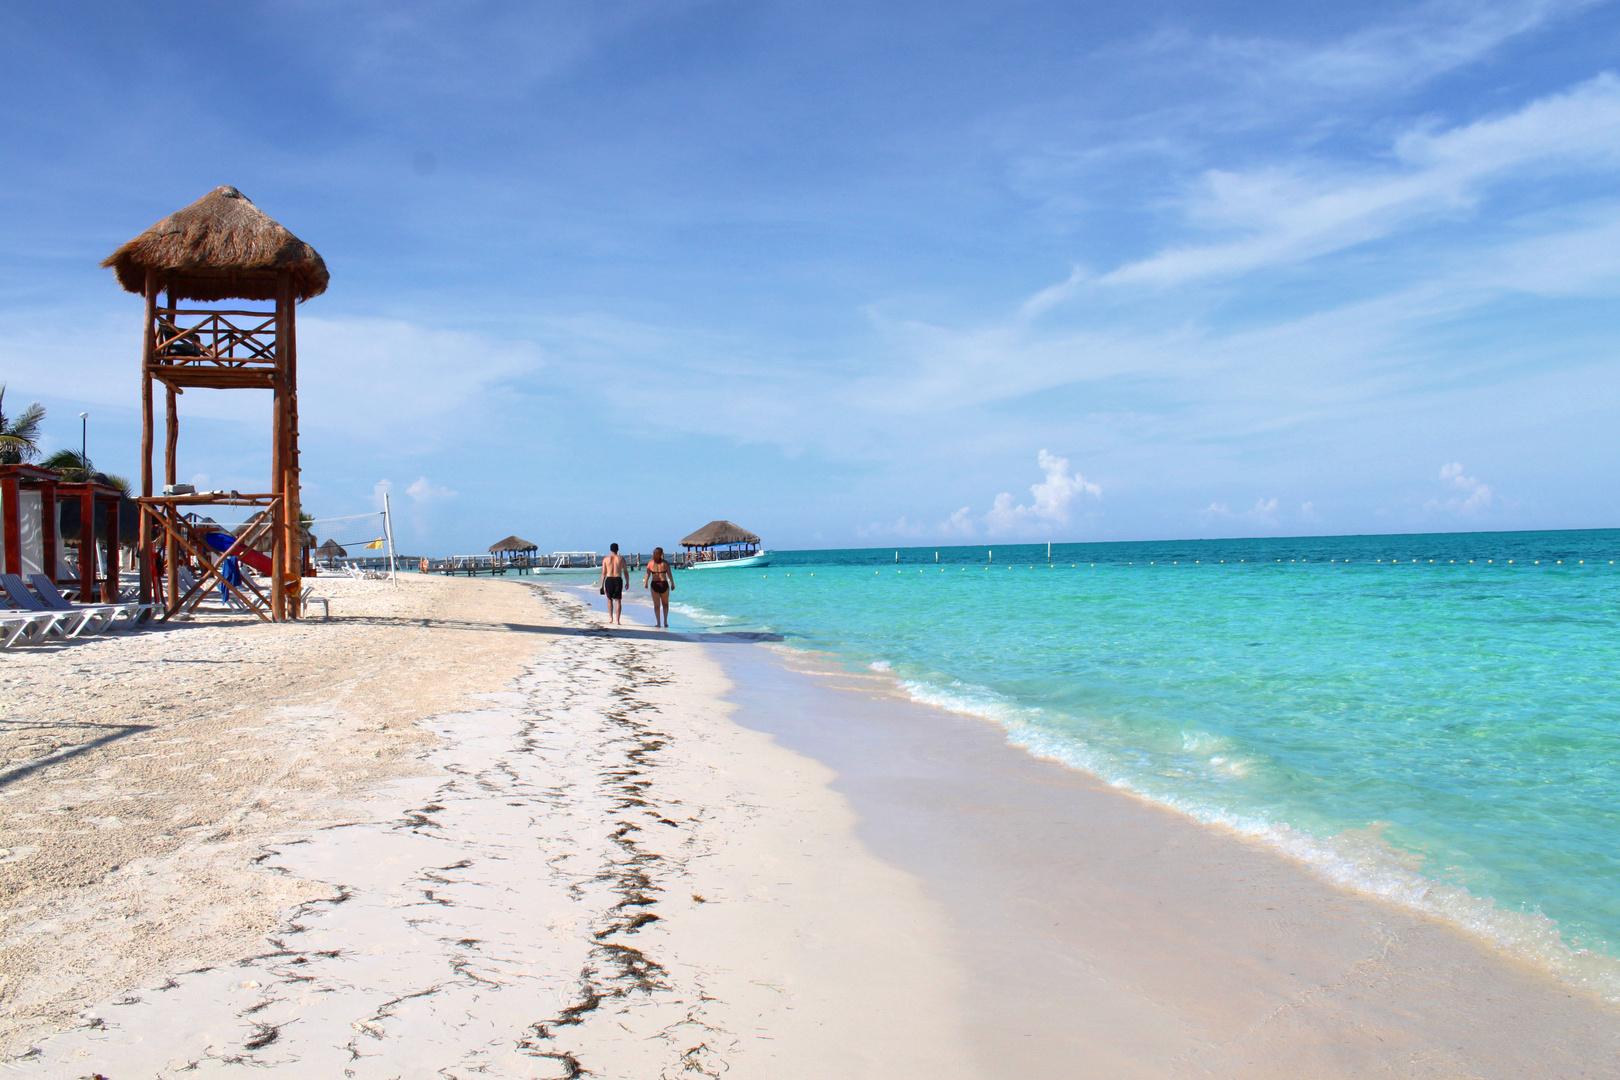 Karibikfeeling